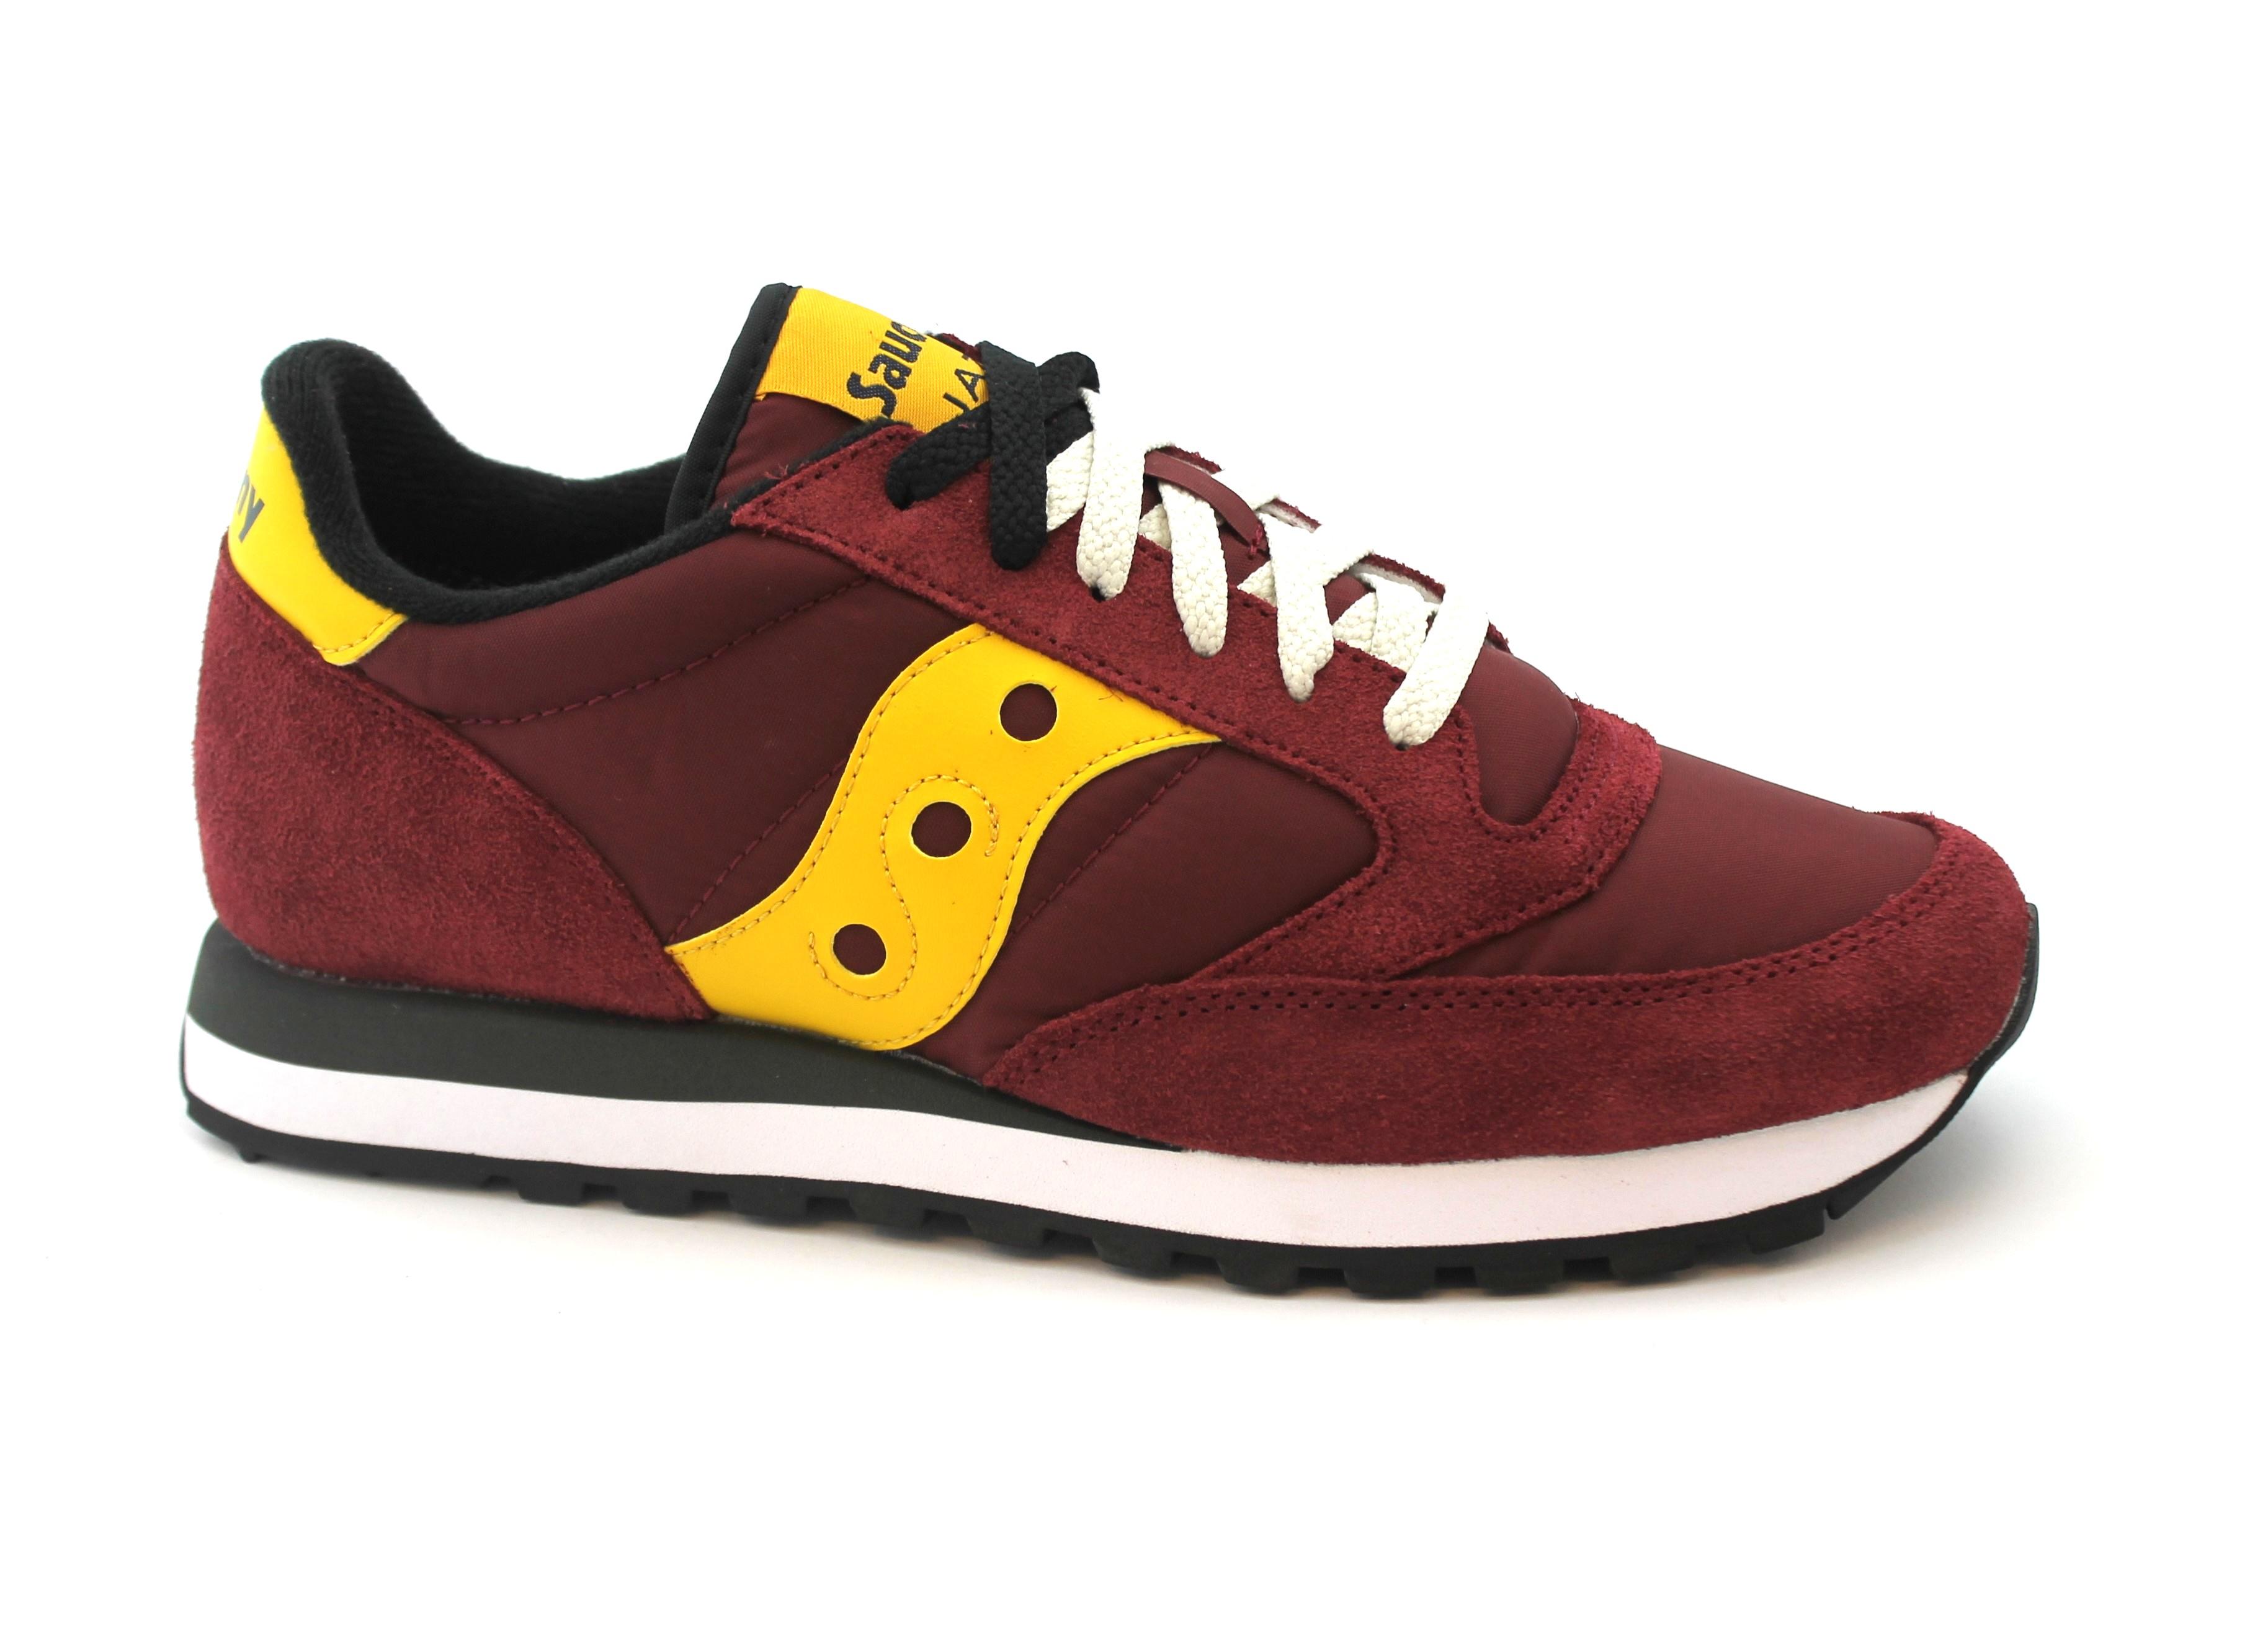 SAUCONY S2044-415 JAZZ scarpe ORIGINAL  rosso giallo scarpe JAZZ uomo sneakers lacci 8bee09